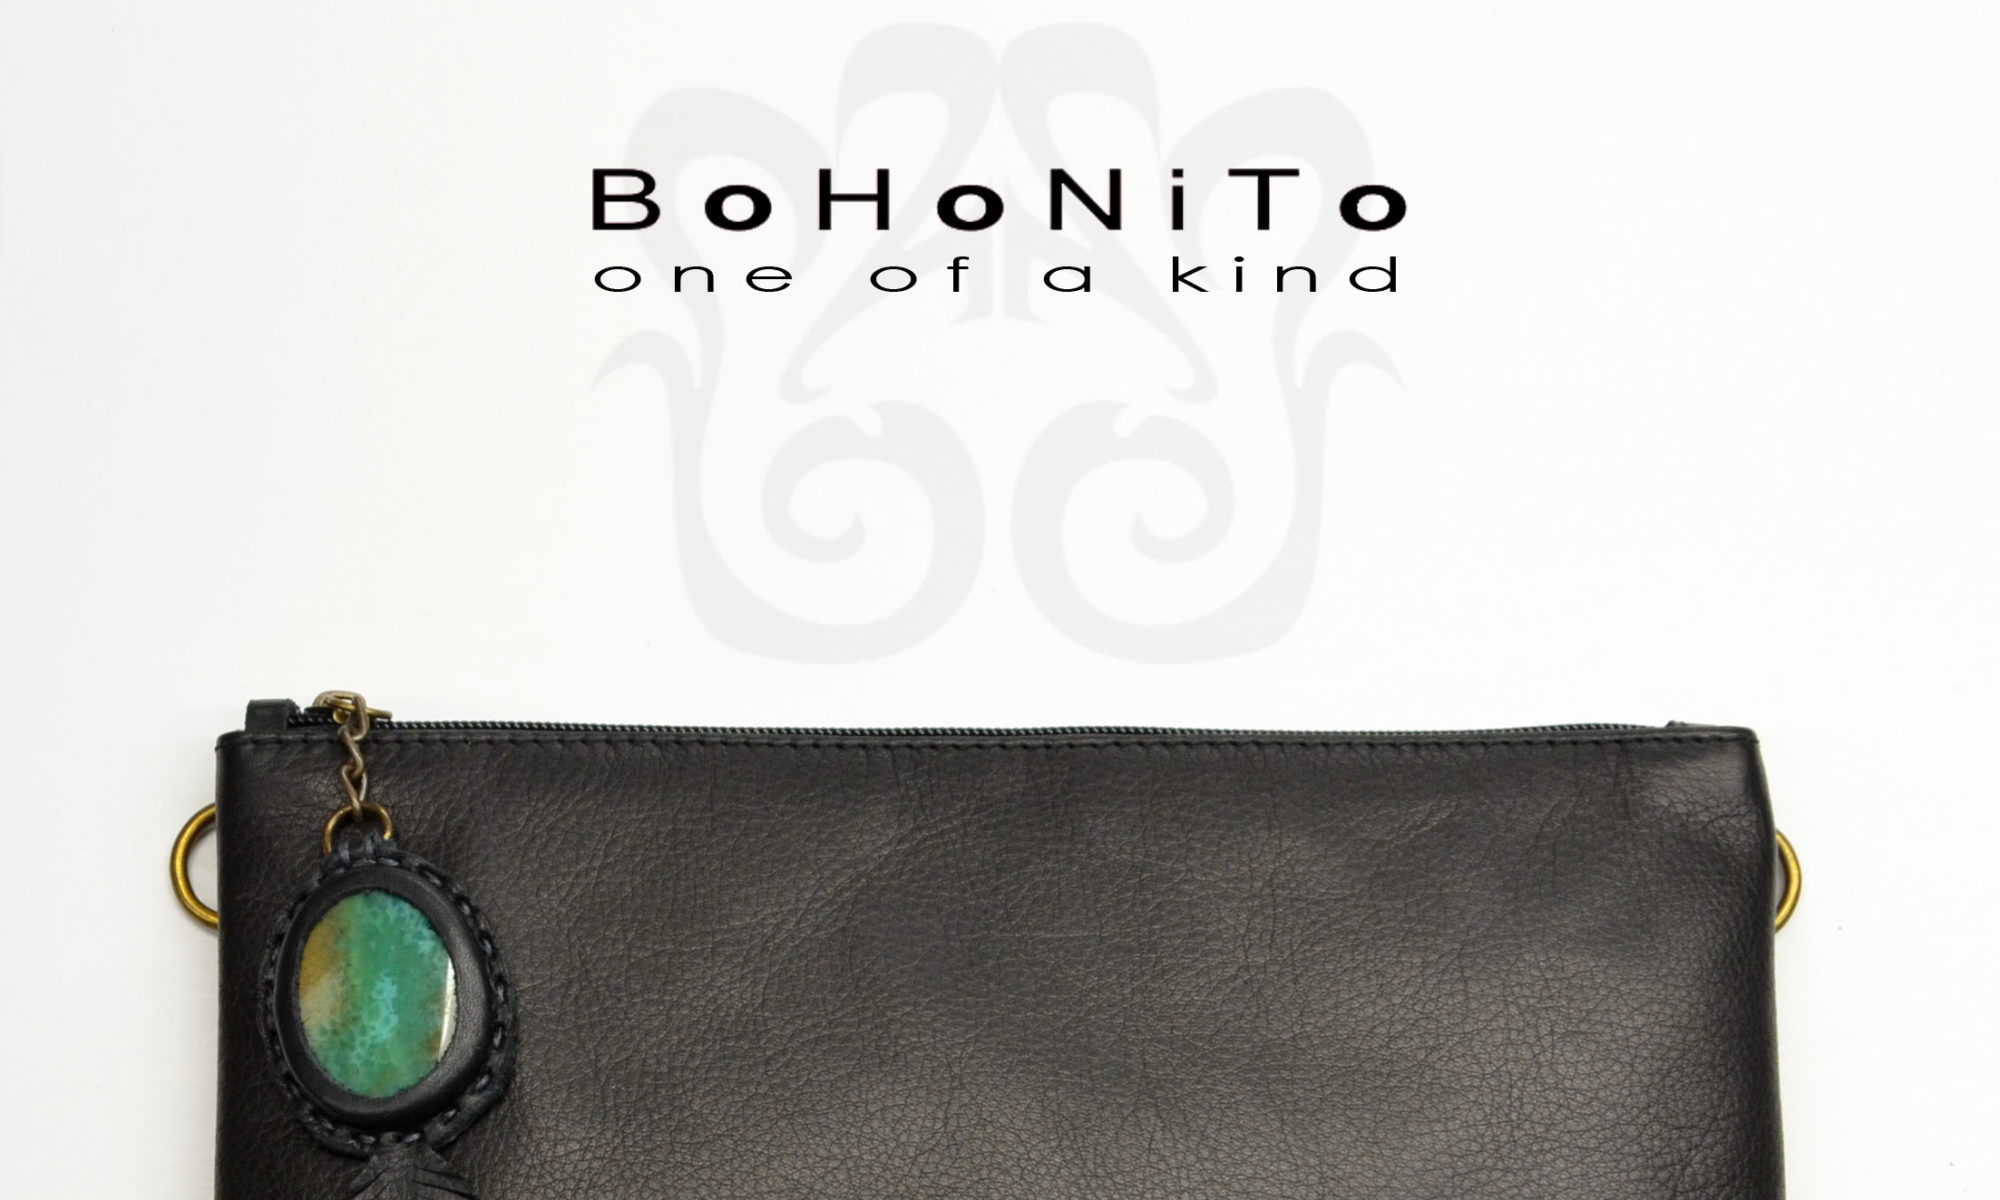 Bohonito